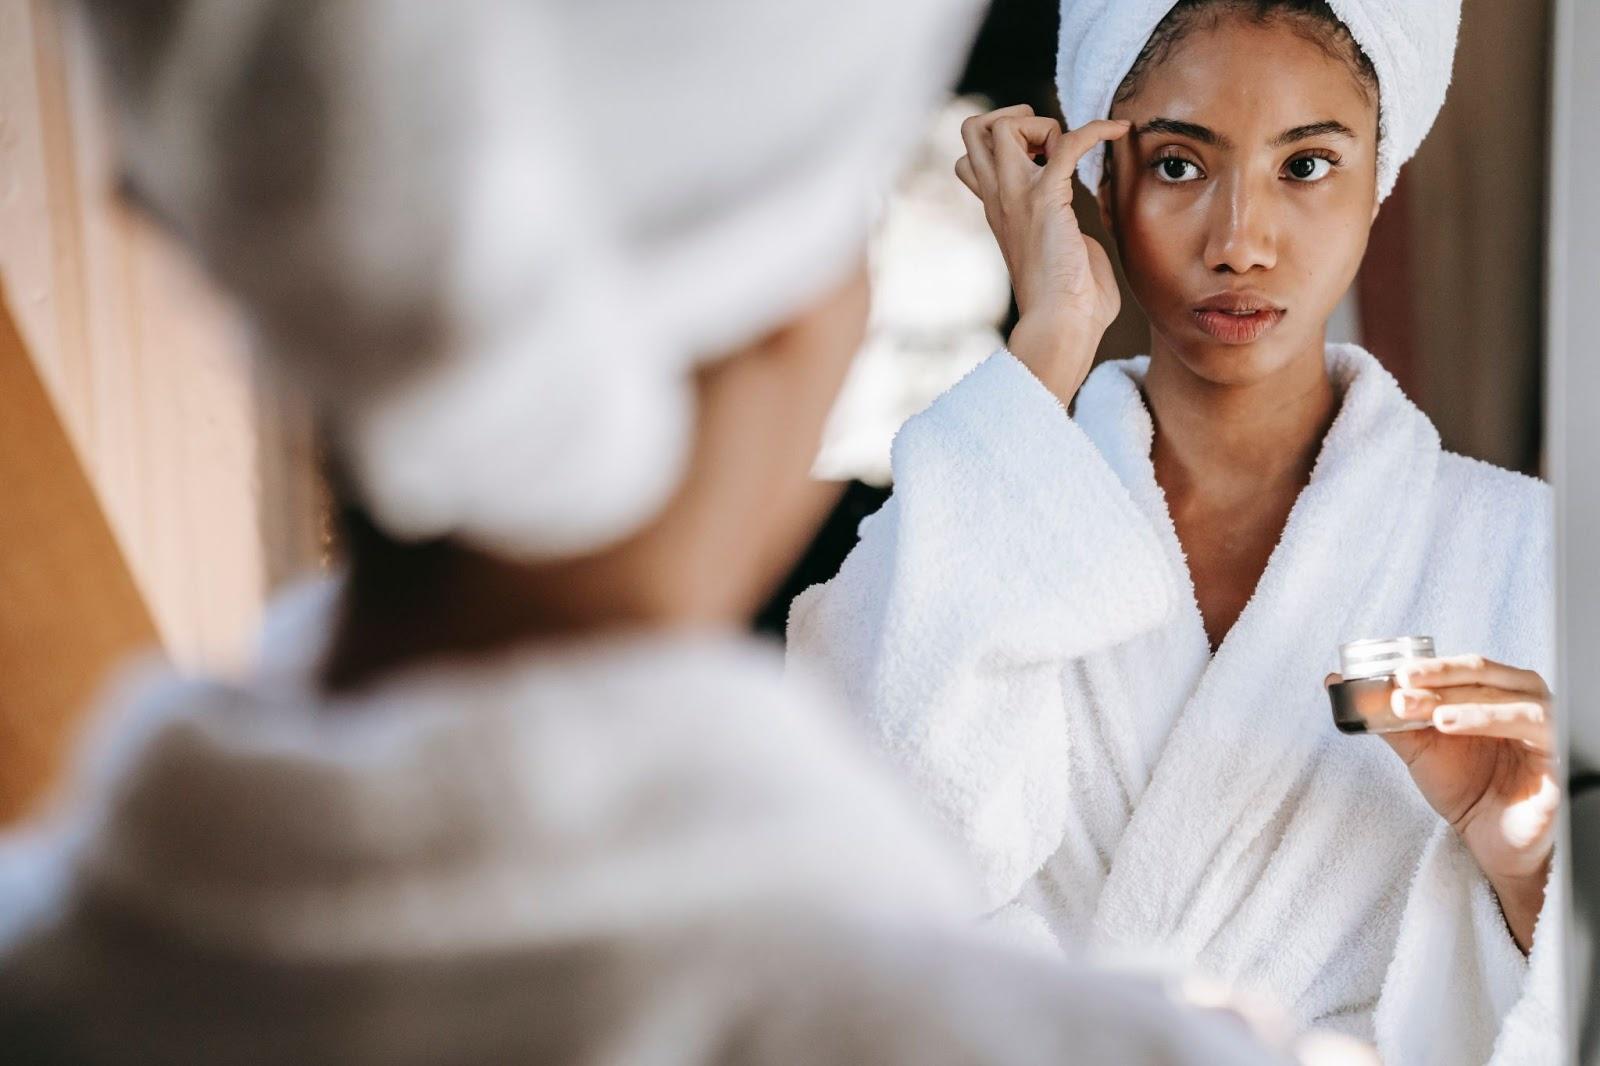 A Beginner Anti-Aging Skincare Guide